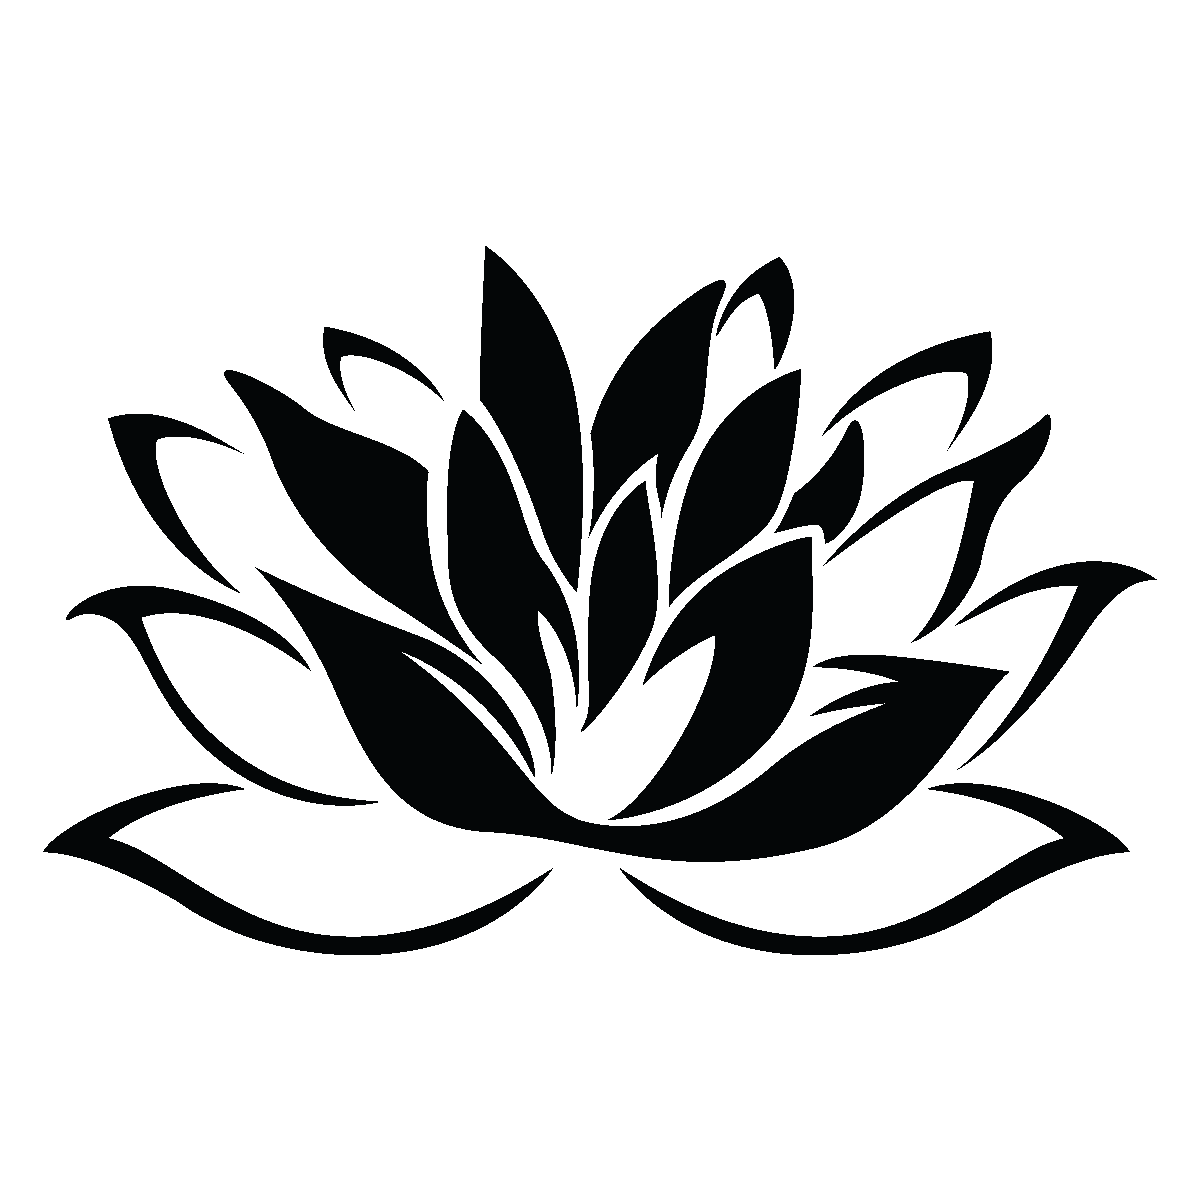 Beliebt Stickers muraux fleurs - Sticker Fleur de lotus | Ambiance-sticker.com TG49